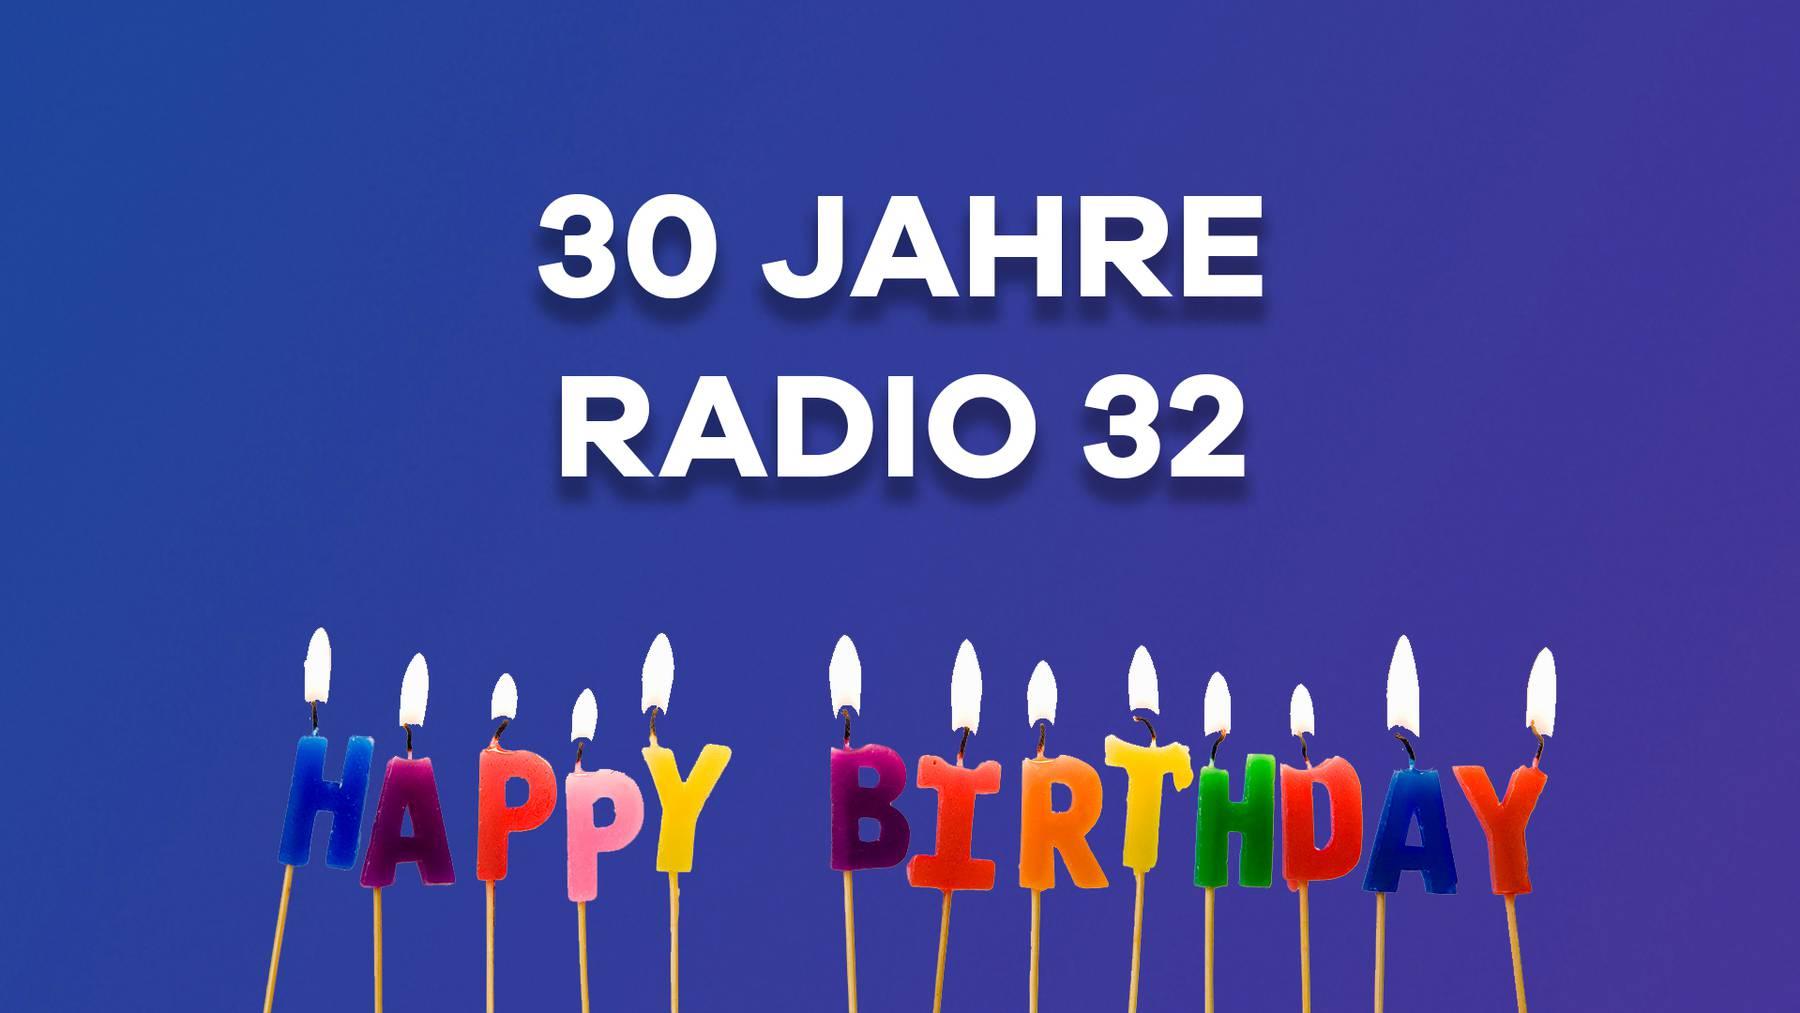 30 Jahre Radio 32 Geburtstag